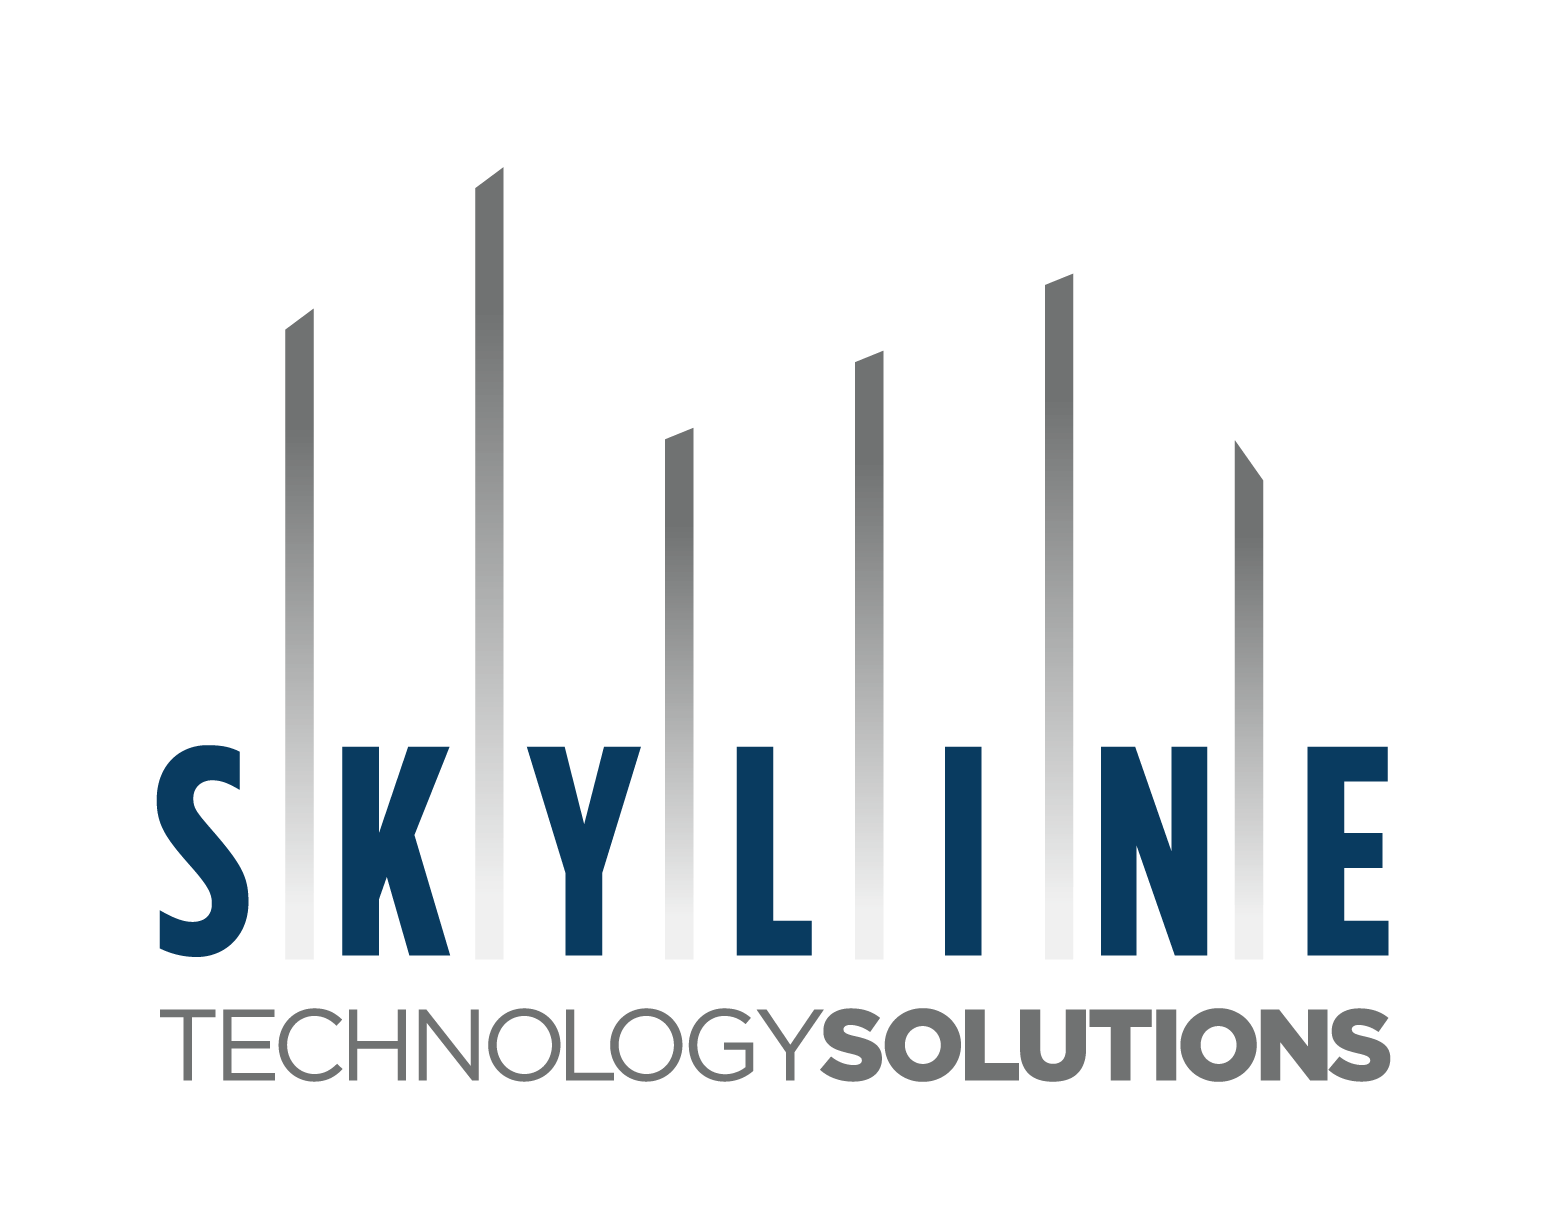 MACo Welcomes Skyline as New Platinum Corporate Partner!